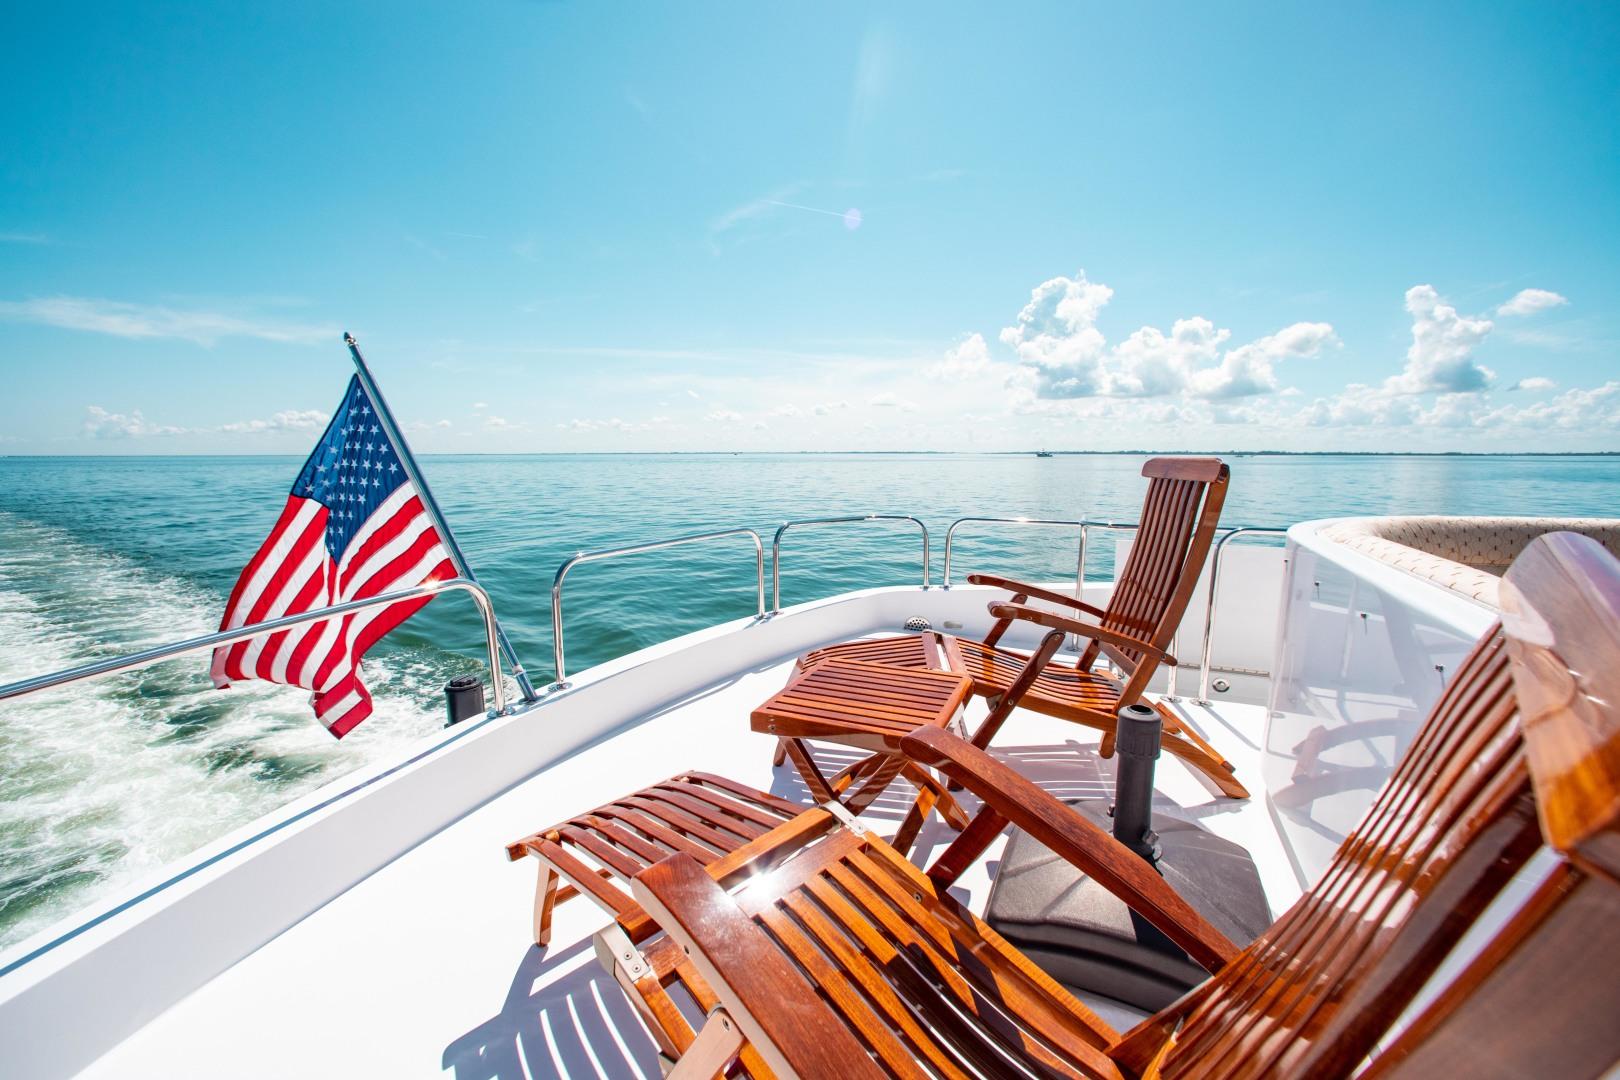 Hatteras-80 Motor Yacht 2008-Galati Yacht Sales Trade Anna Maria-Florida-United States-2008 Hatteras 80 Motor Yacht  Galati Yacht Sales Trade  Skylounge Aft Deck-1466259 | Thumbnail